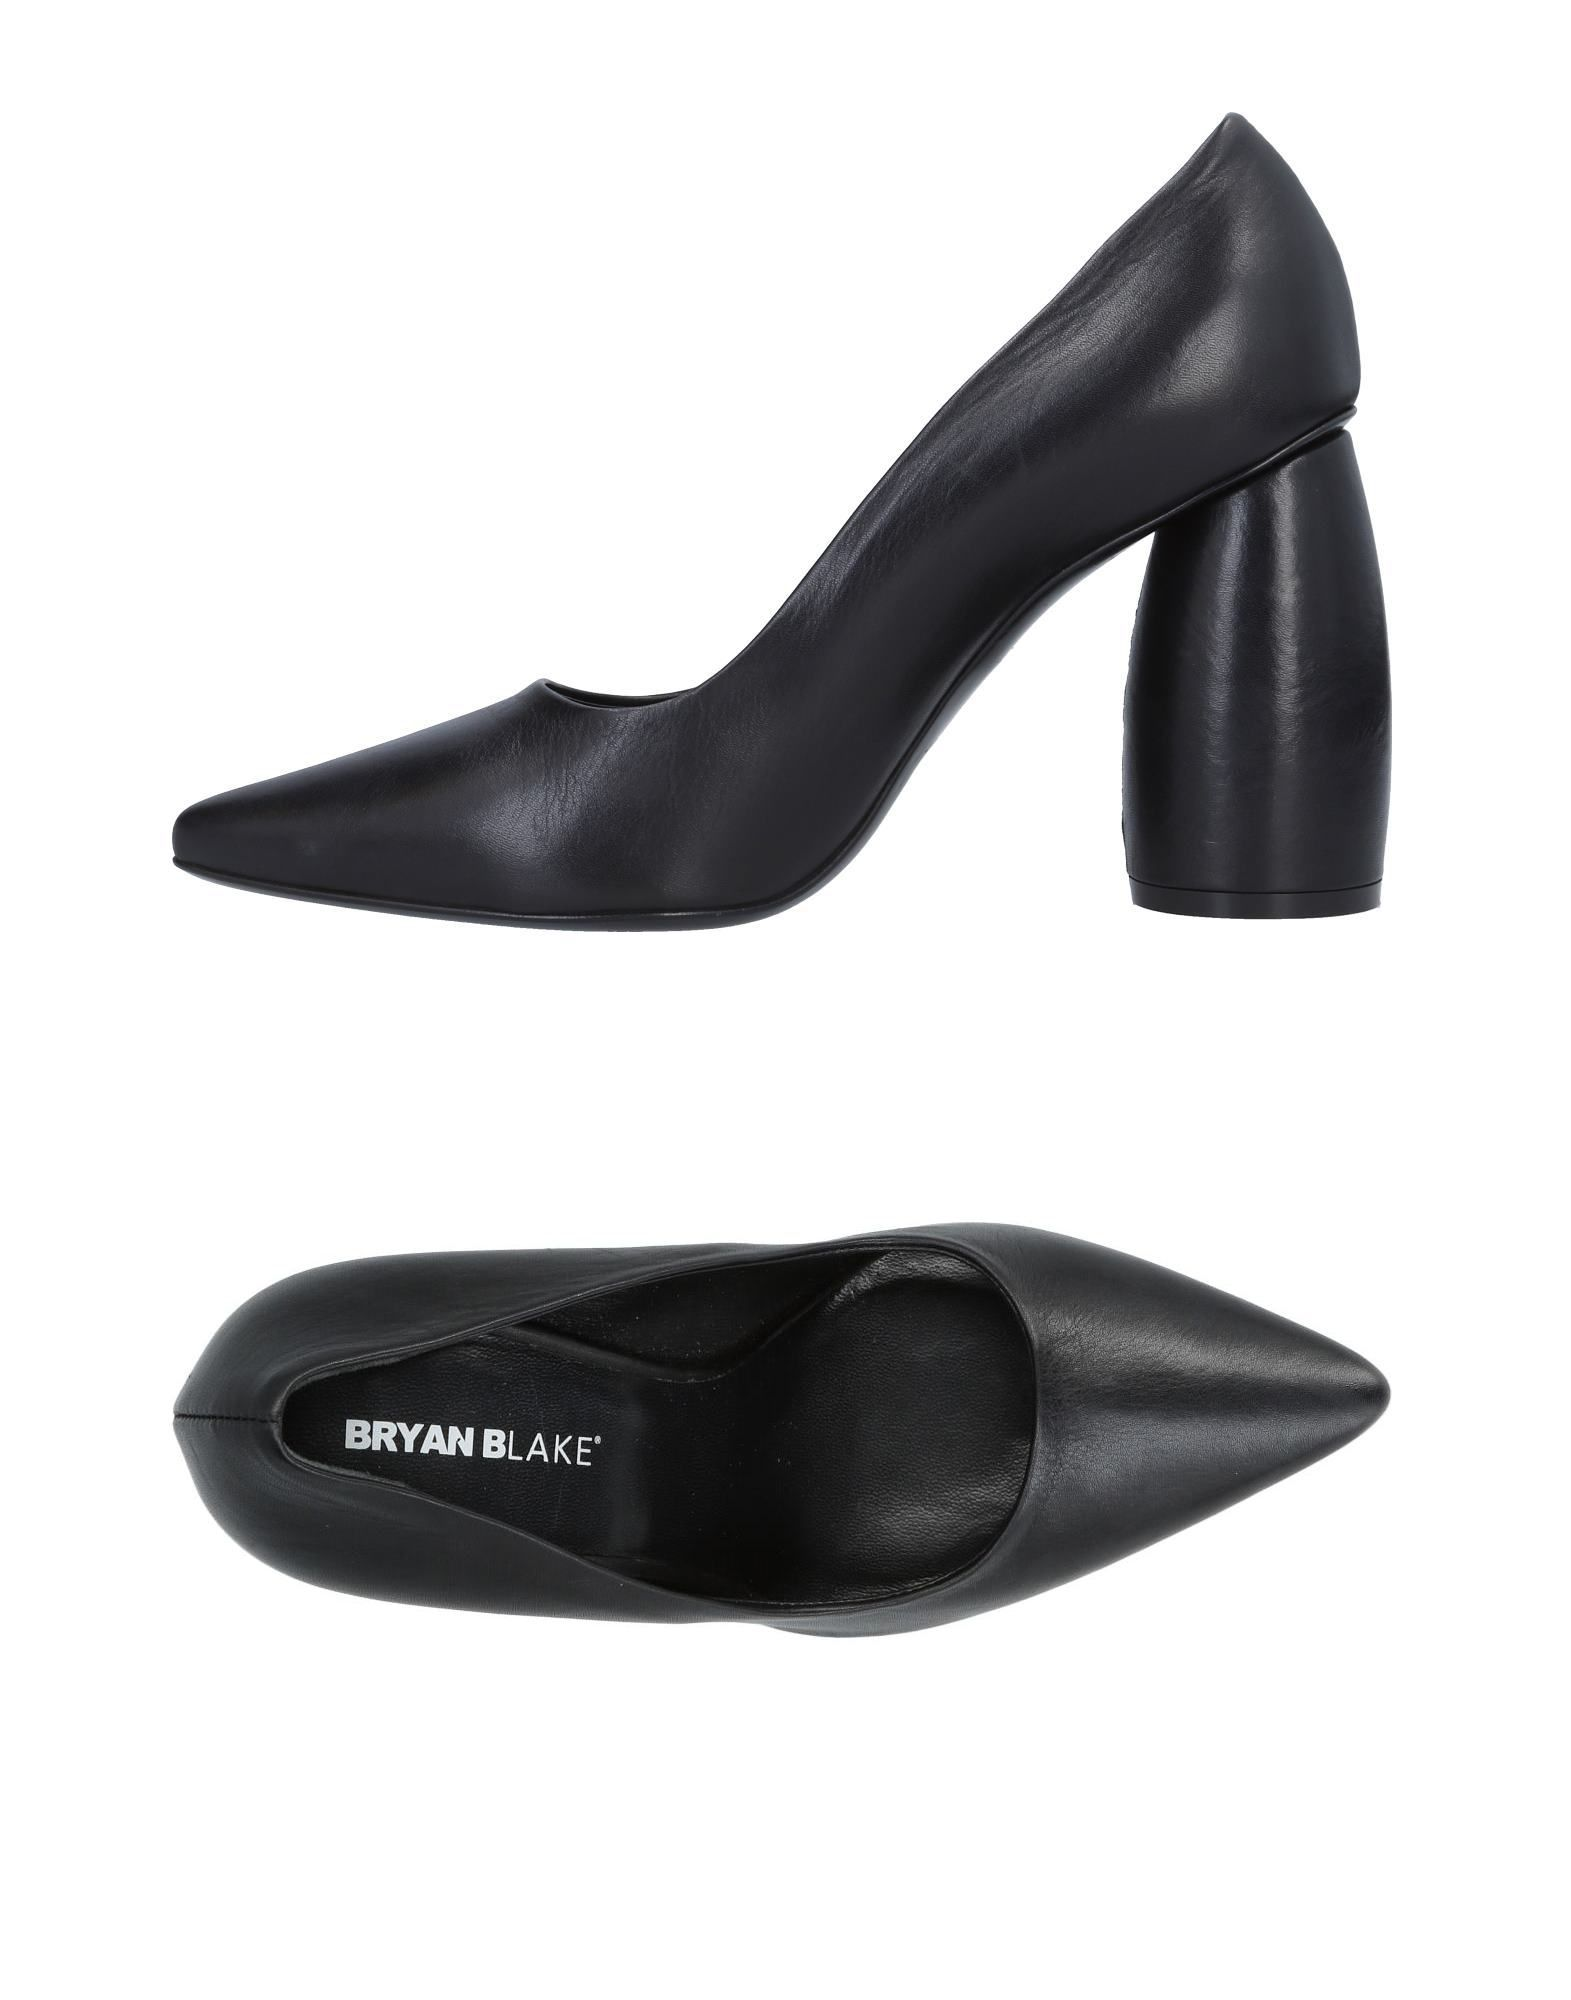 BRYAN BLAKE Туфли cie round toe mackay blake custom handmade calf genuine leather outsole breathable men s casual oxfords color purple shoe ox519